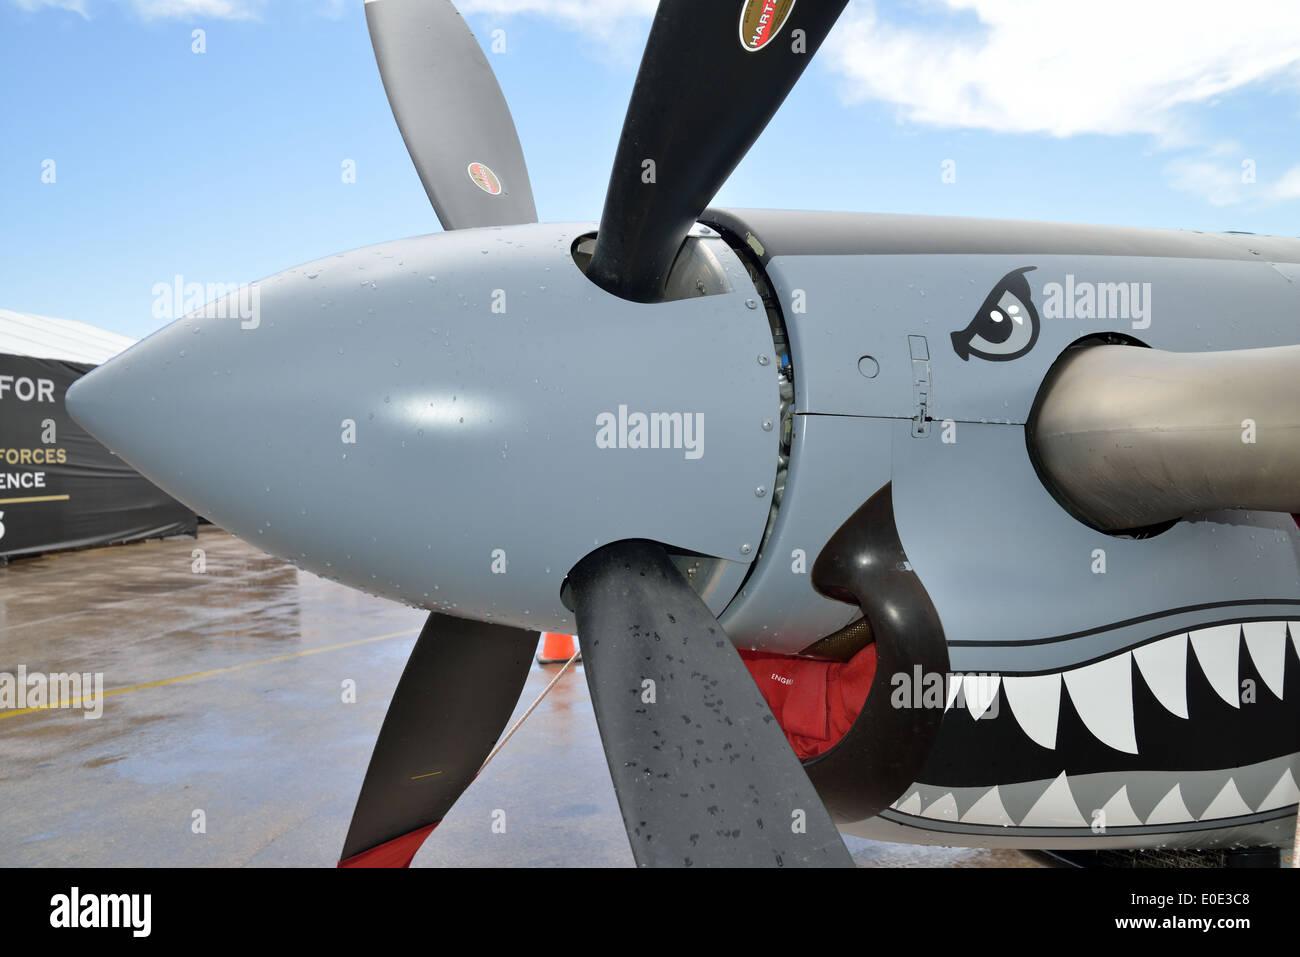 Propeller detail of Pilatus PC-9 M aircraft. - Stock Image